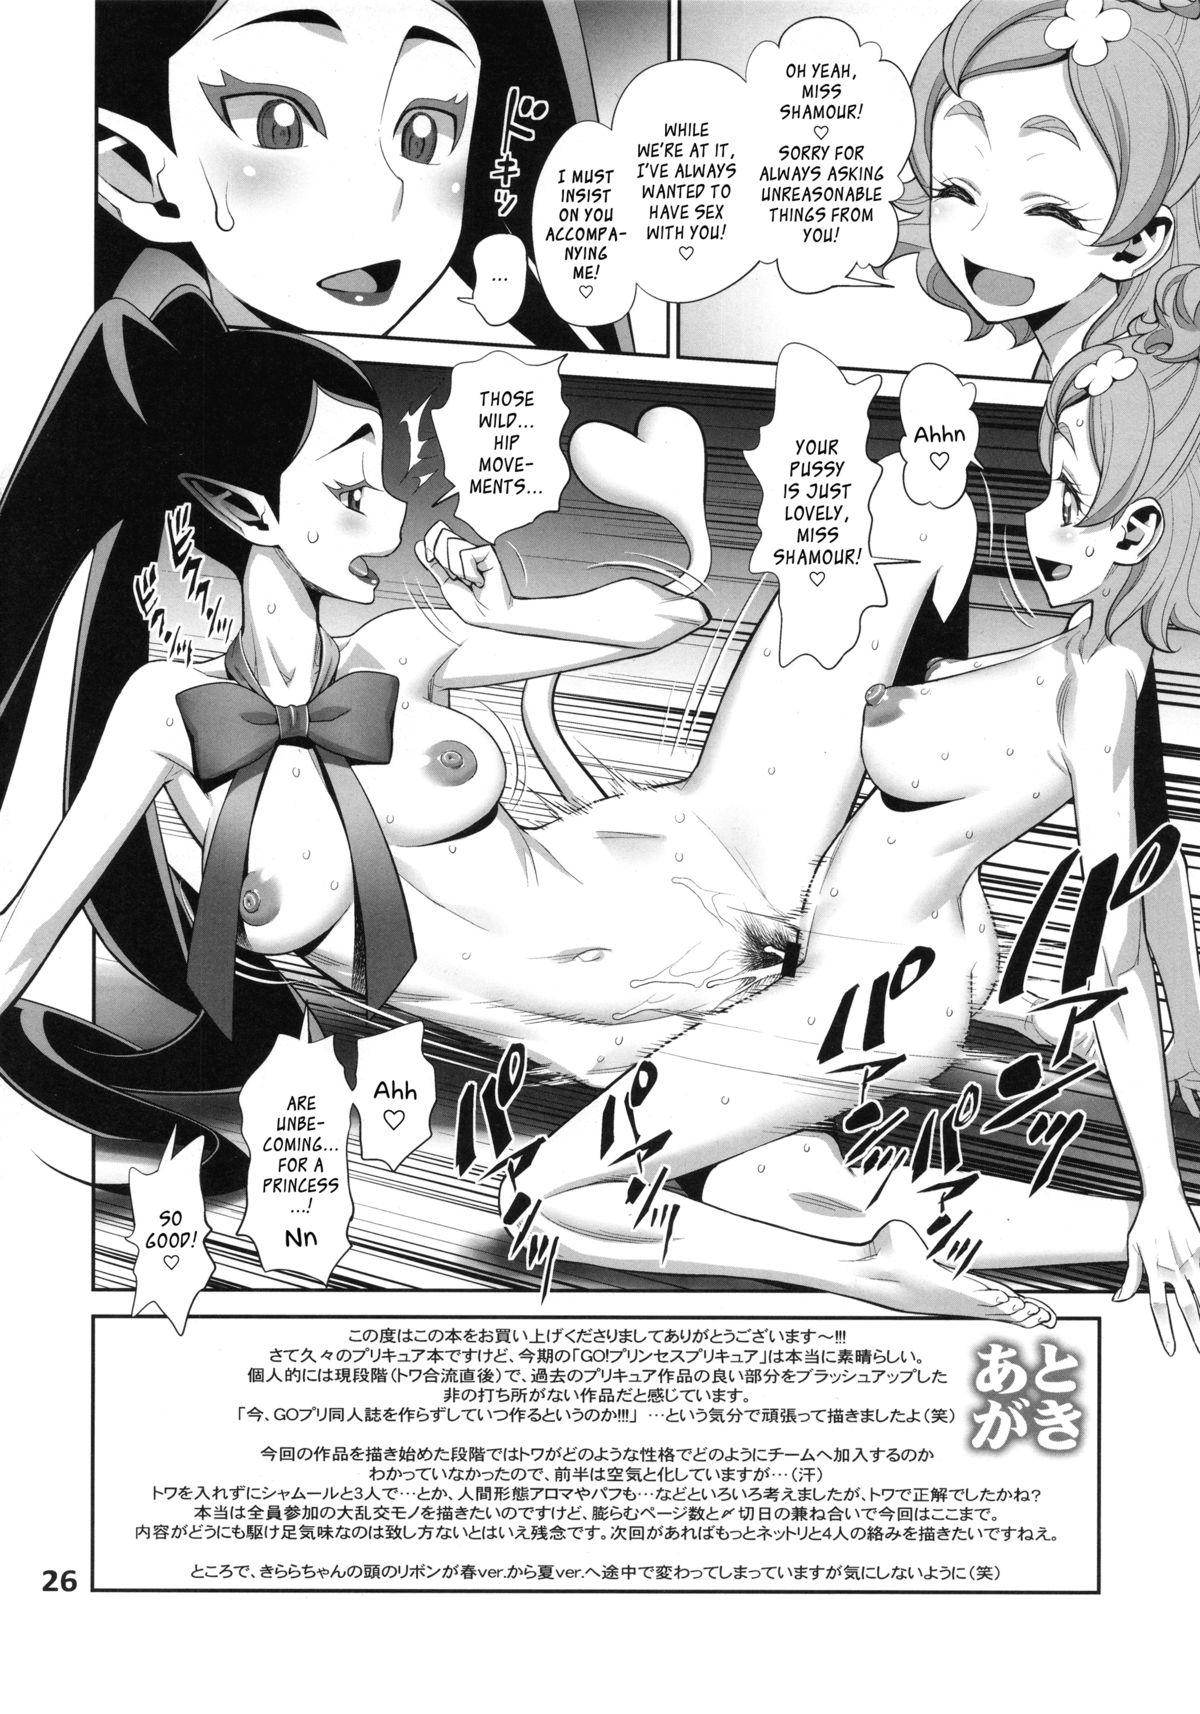 Yoru no Grand Princess | The Grand Princess of the Night 24